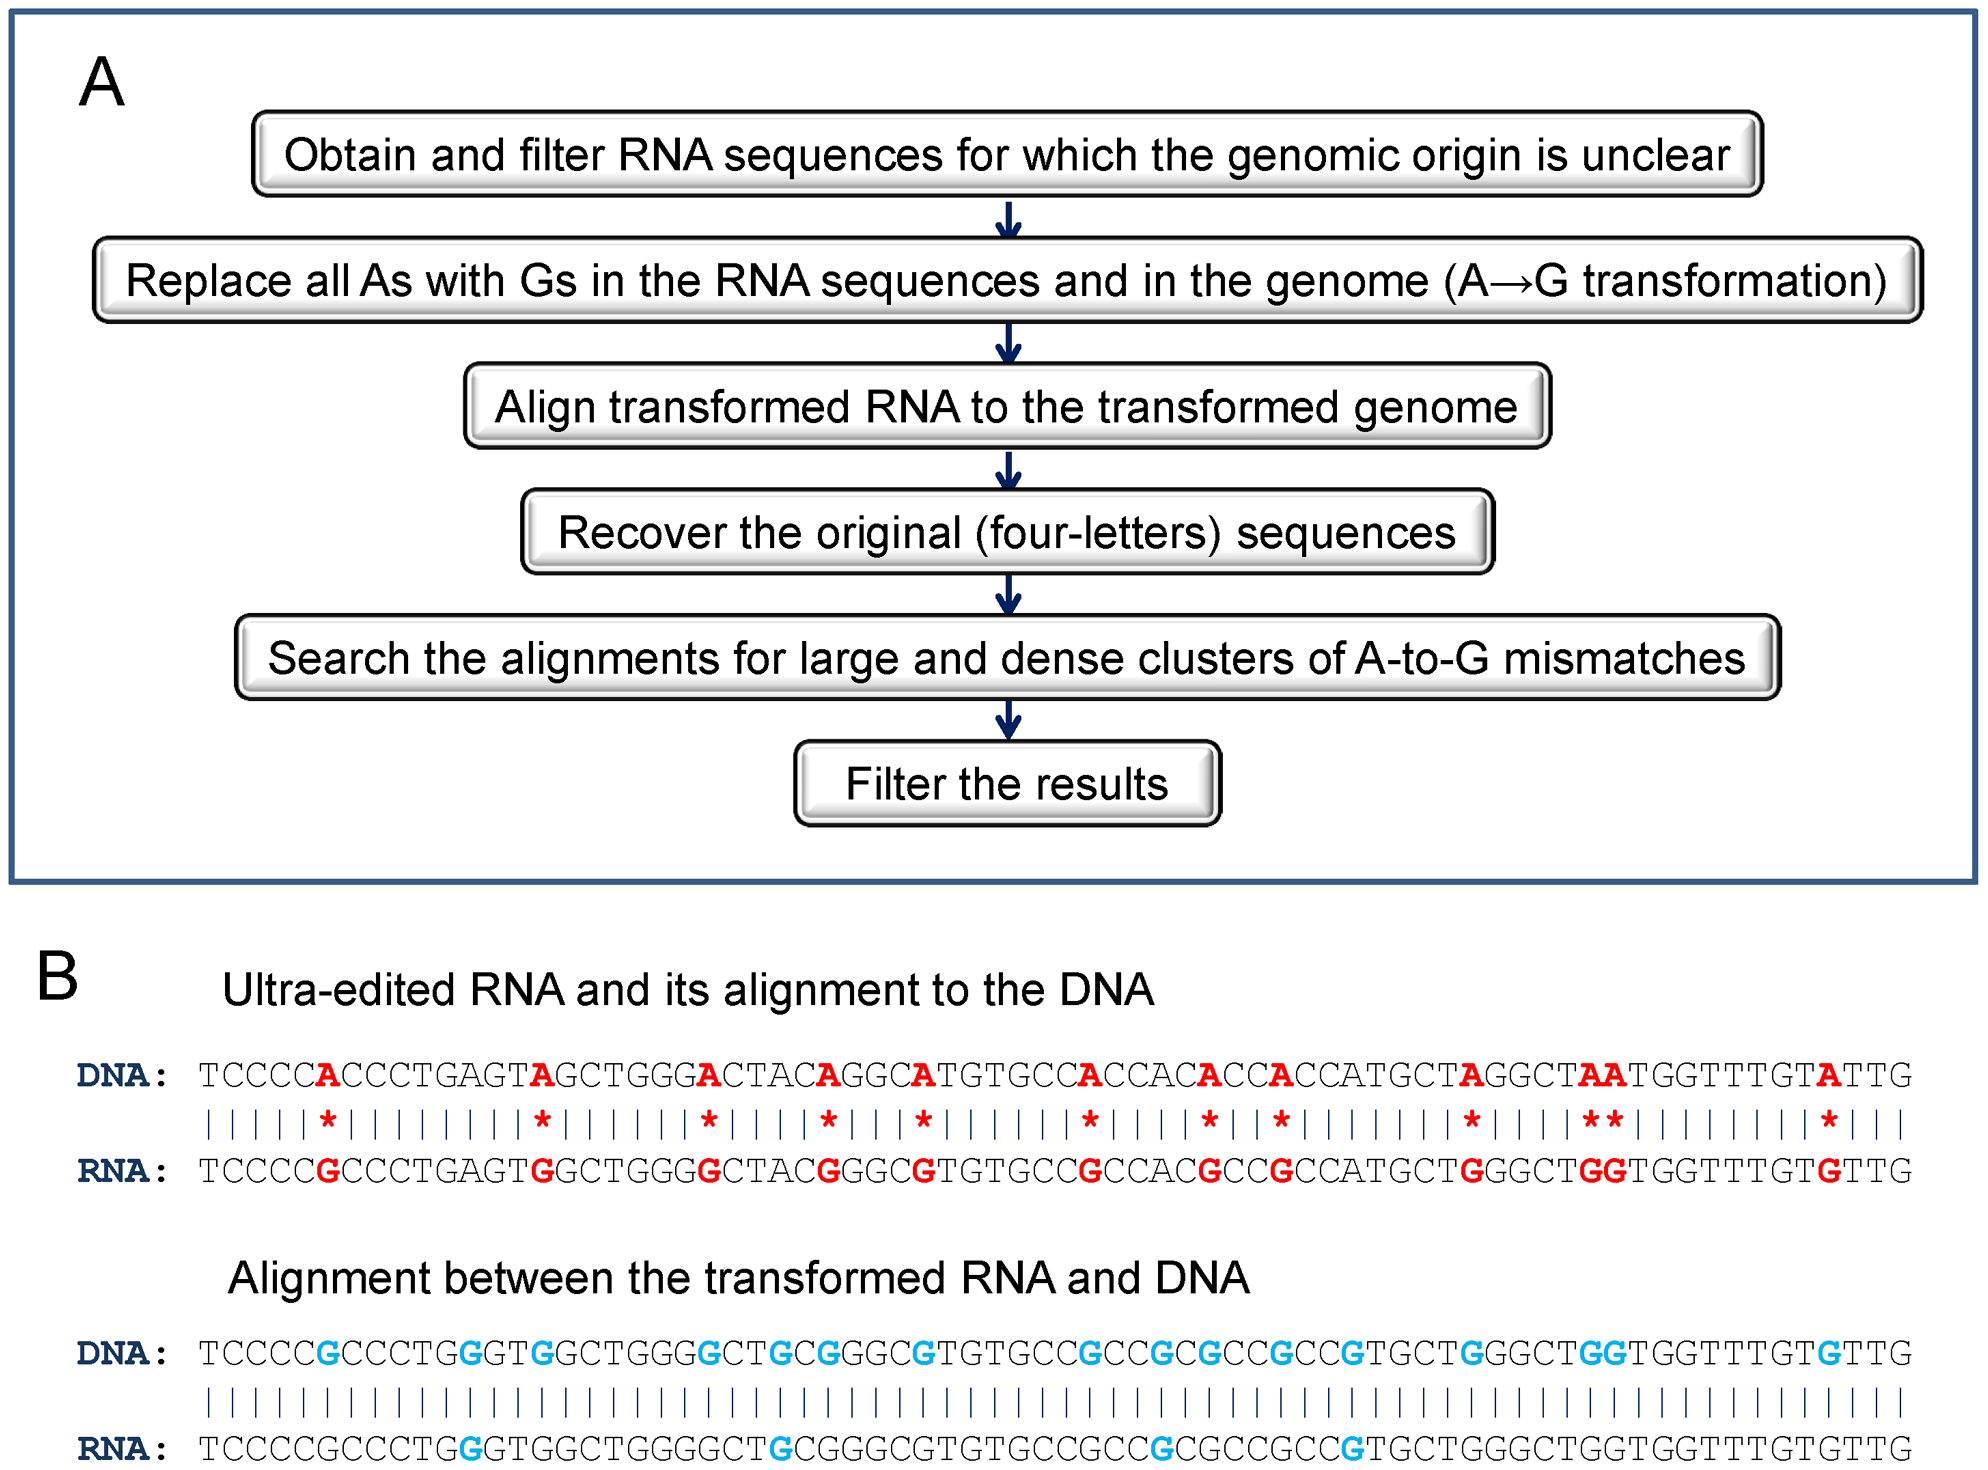 The computational procedure used to detect ultra-edited RNA.